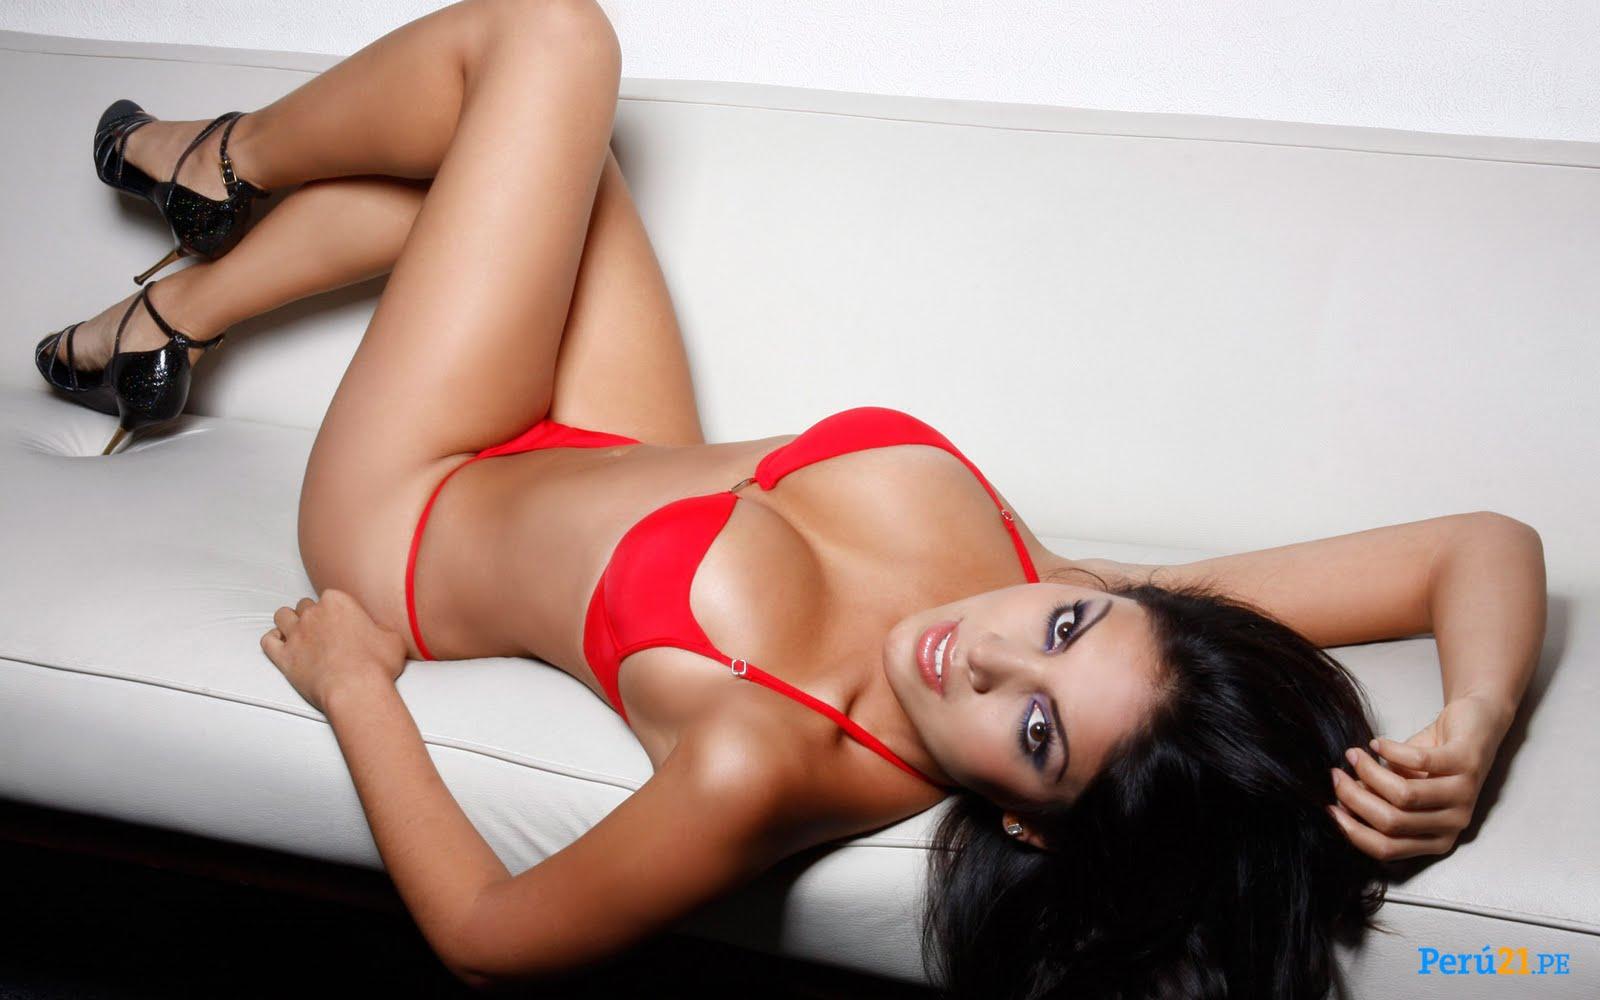 Cynthia Chanta